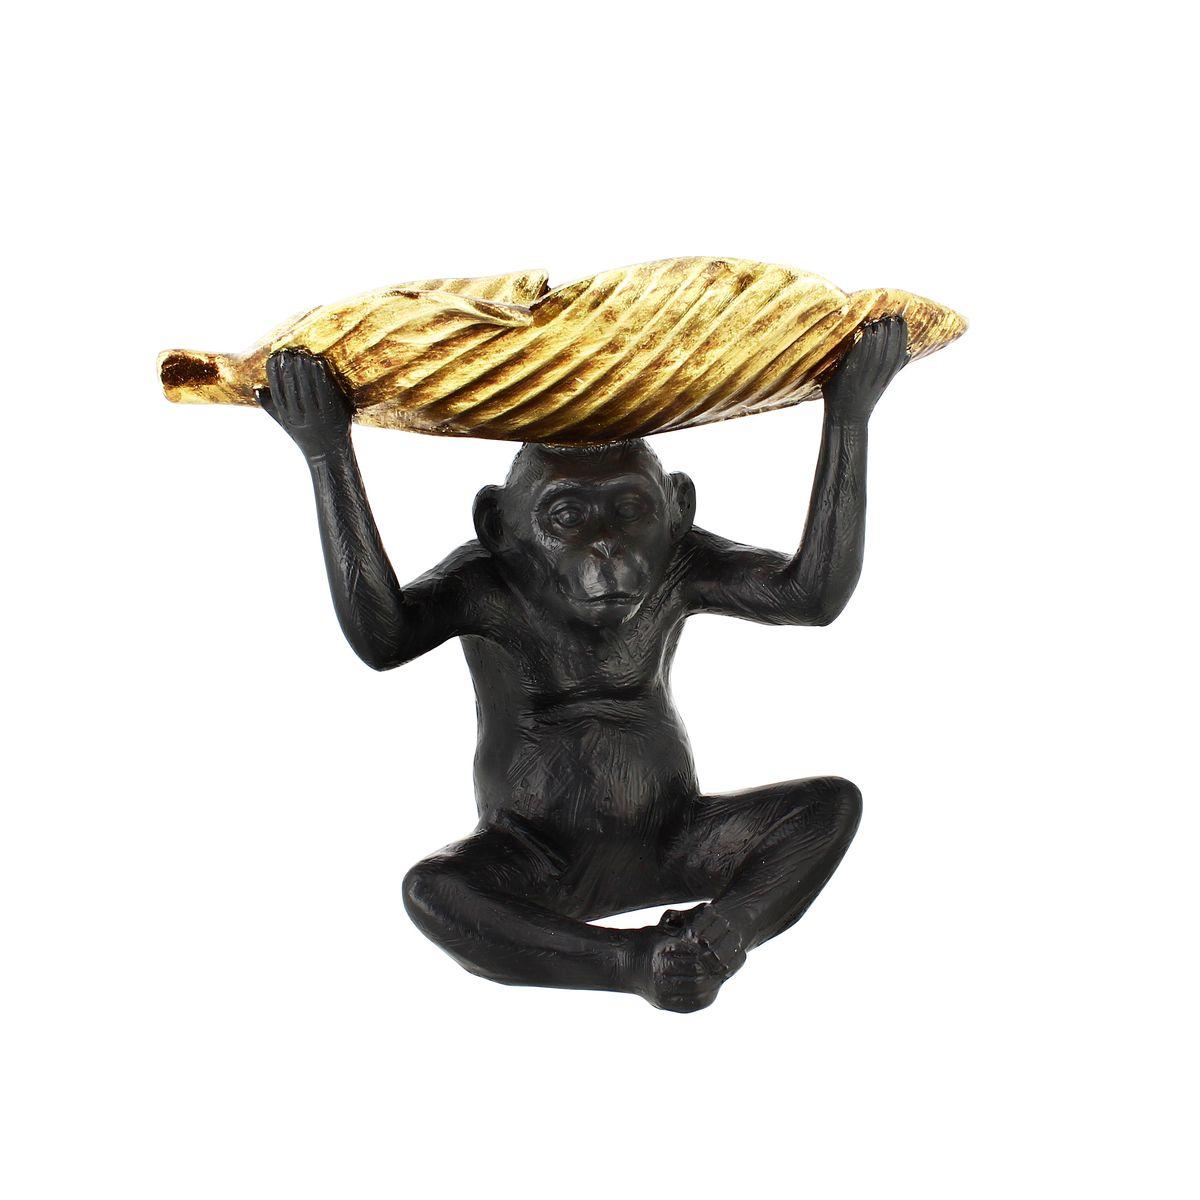 Vide poche singe en résine